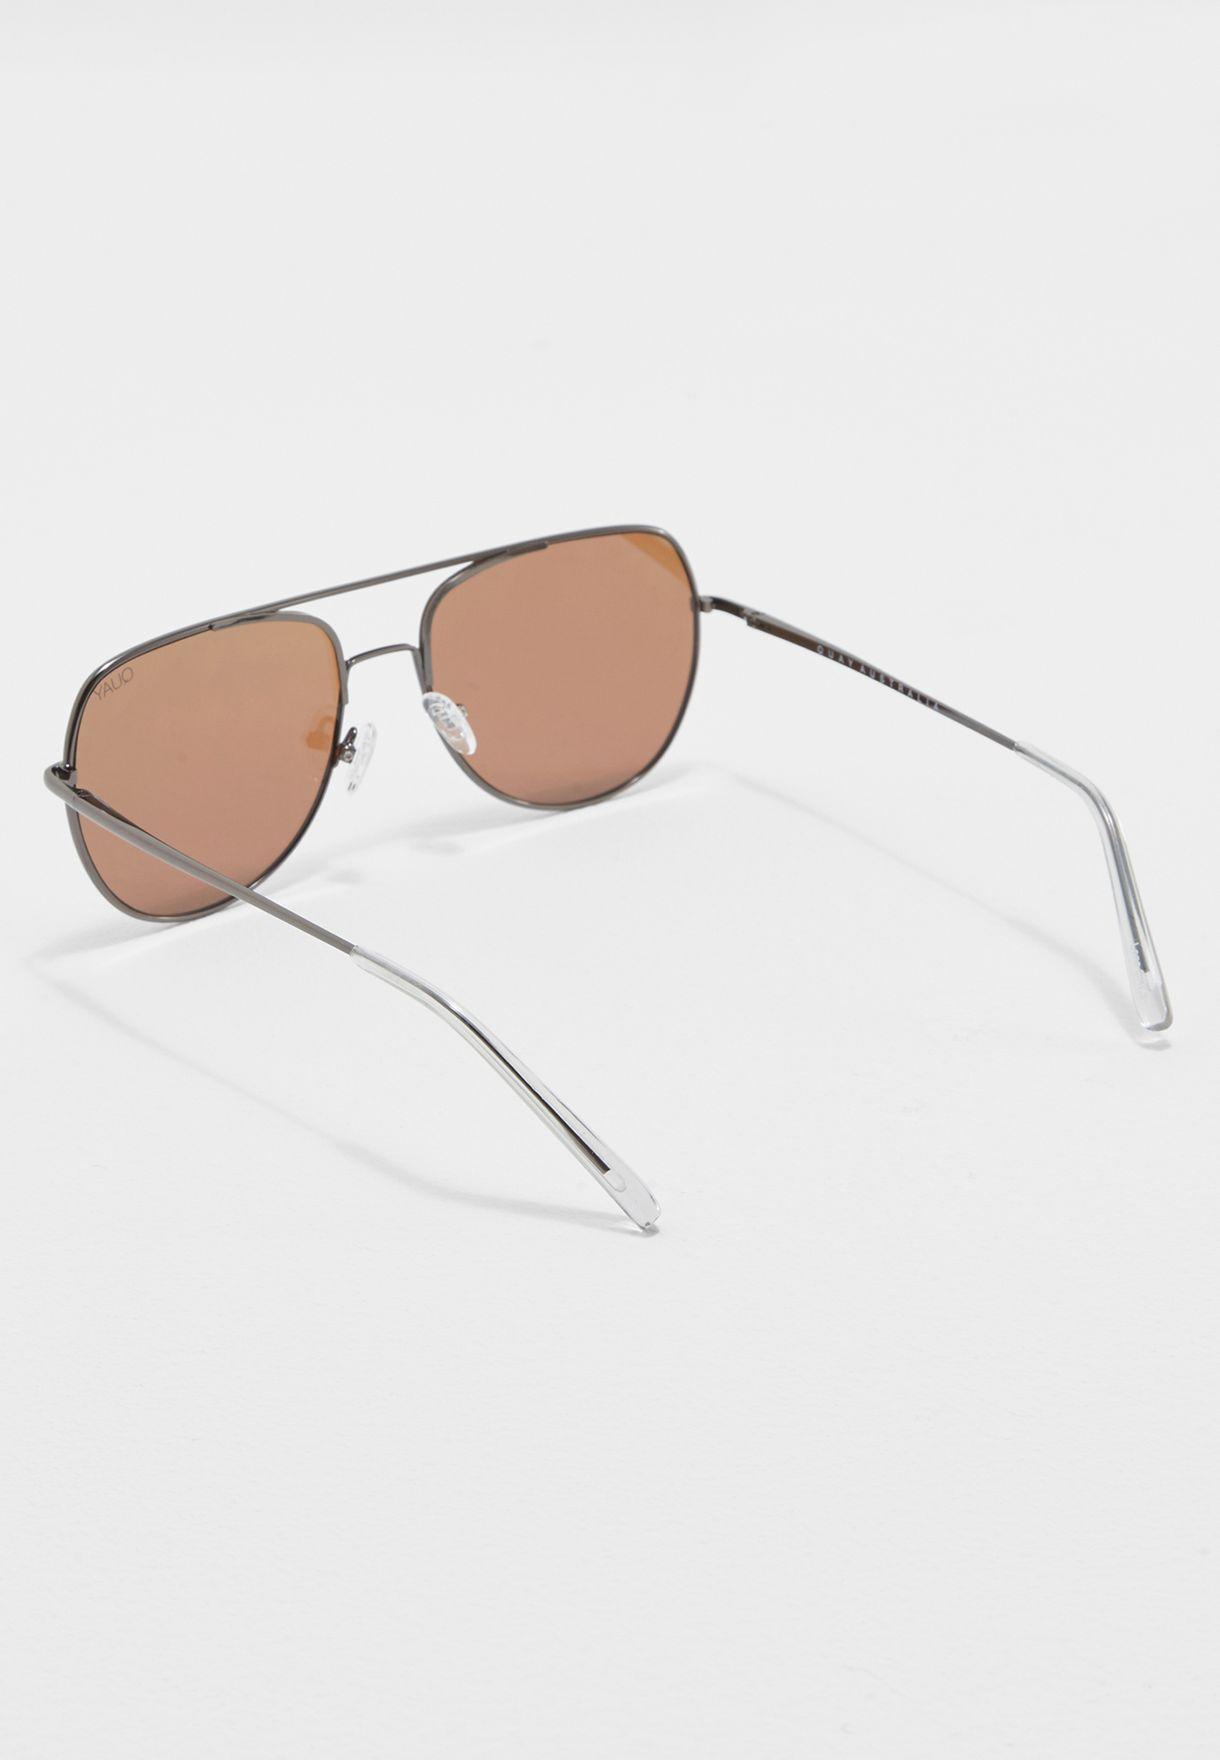 7d648621a2 Shop Quay Australia grey Living Large Sunglasses QM-000200 for Men ...